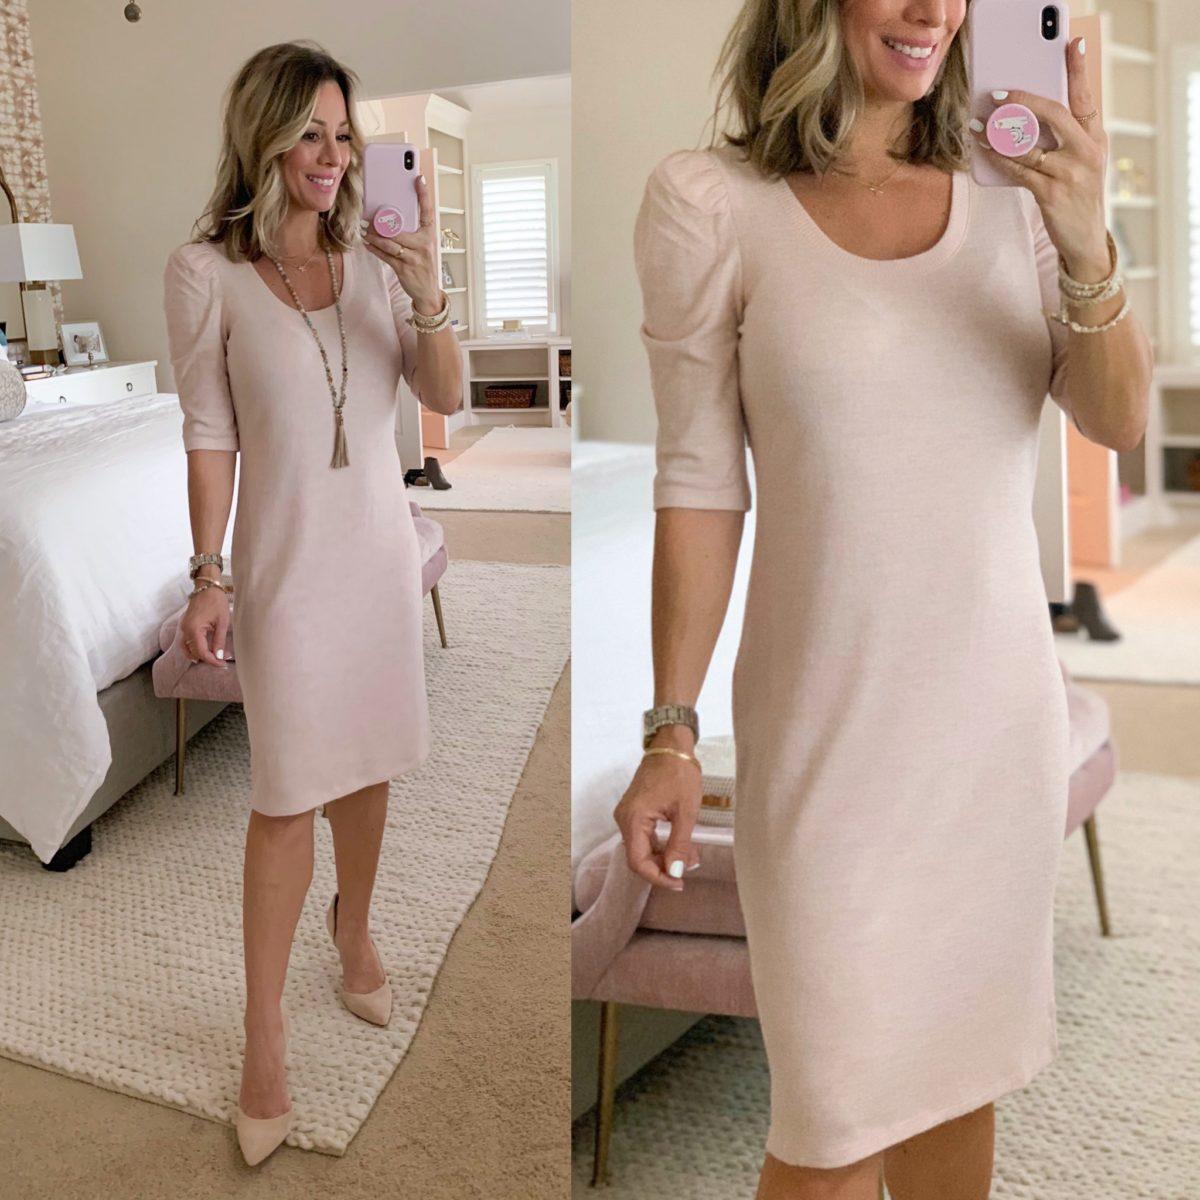 Puff Sleeve Scoop Neck Dress, Pale Pink Heels, Beaded Tassel Necklace